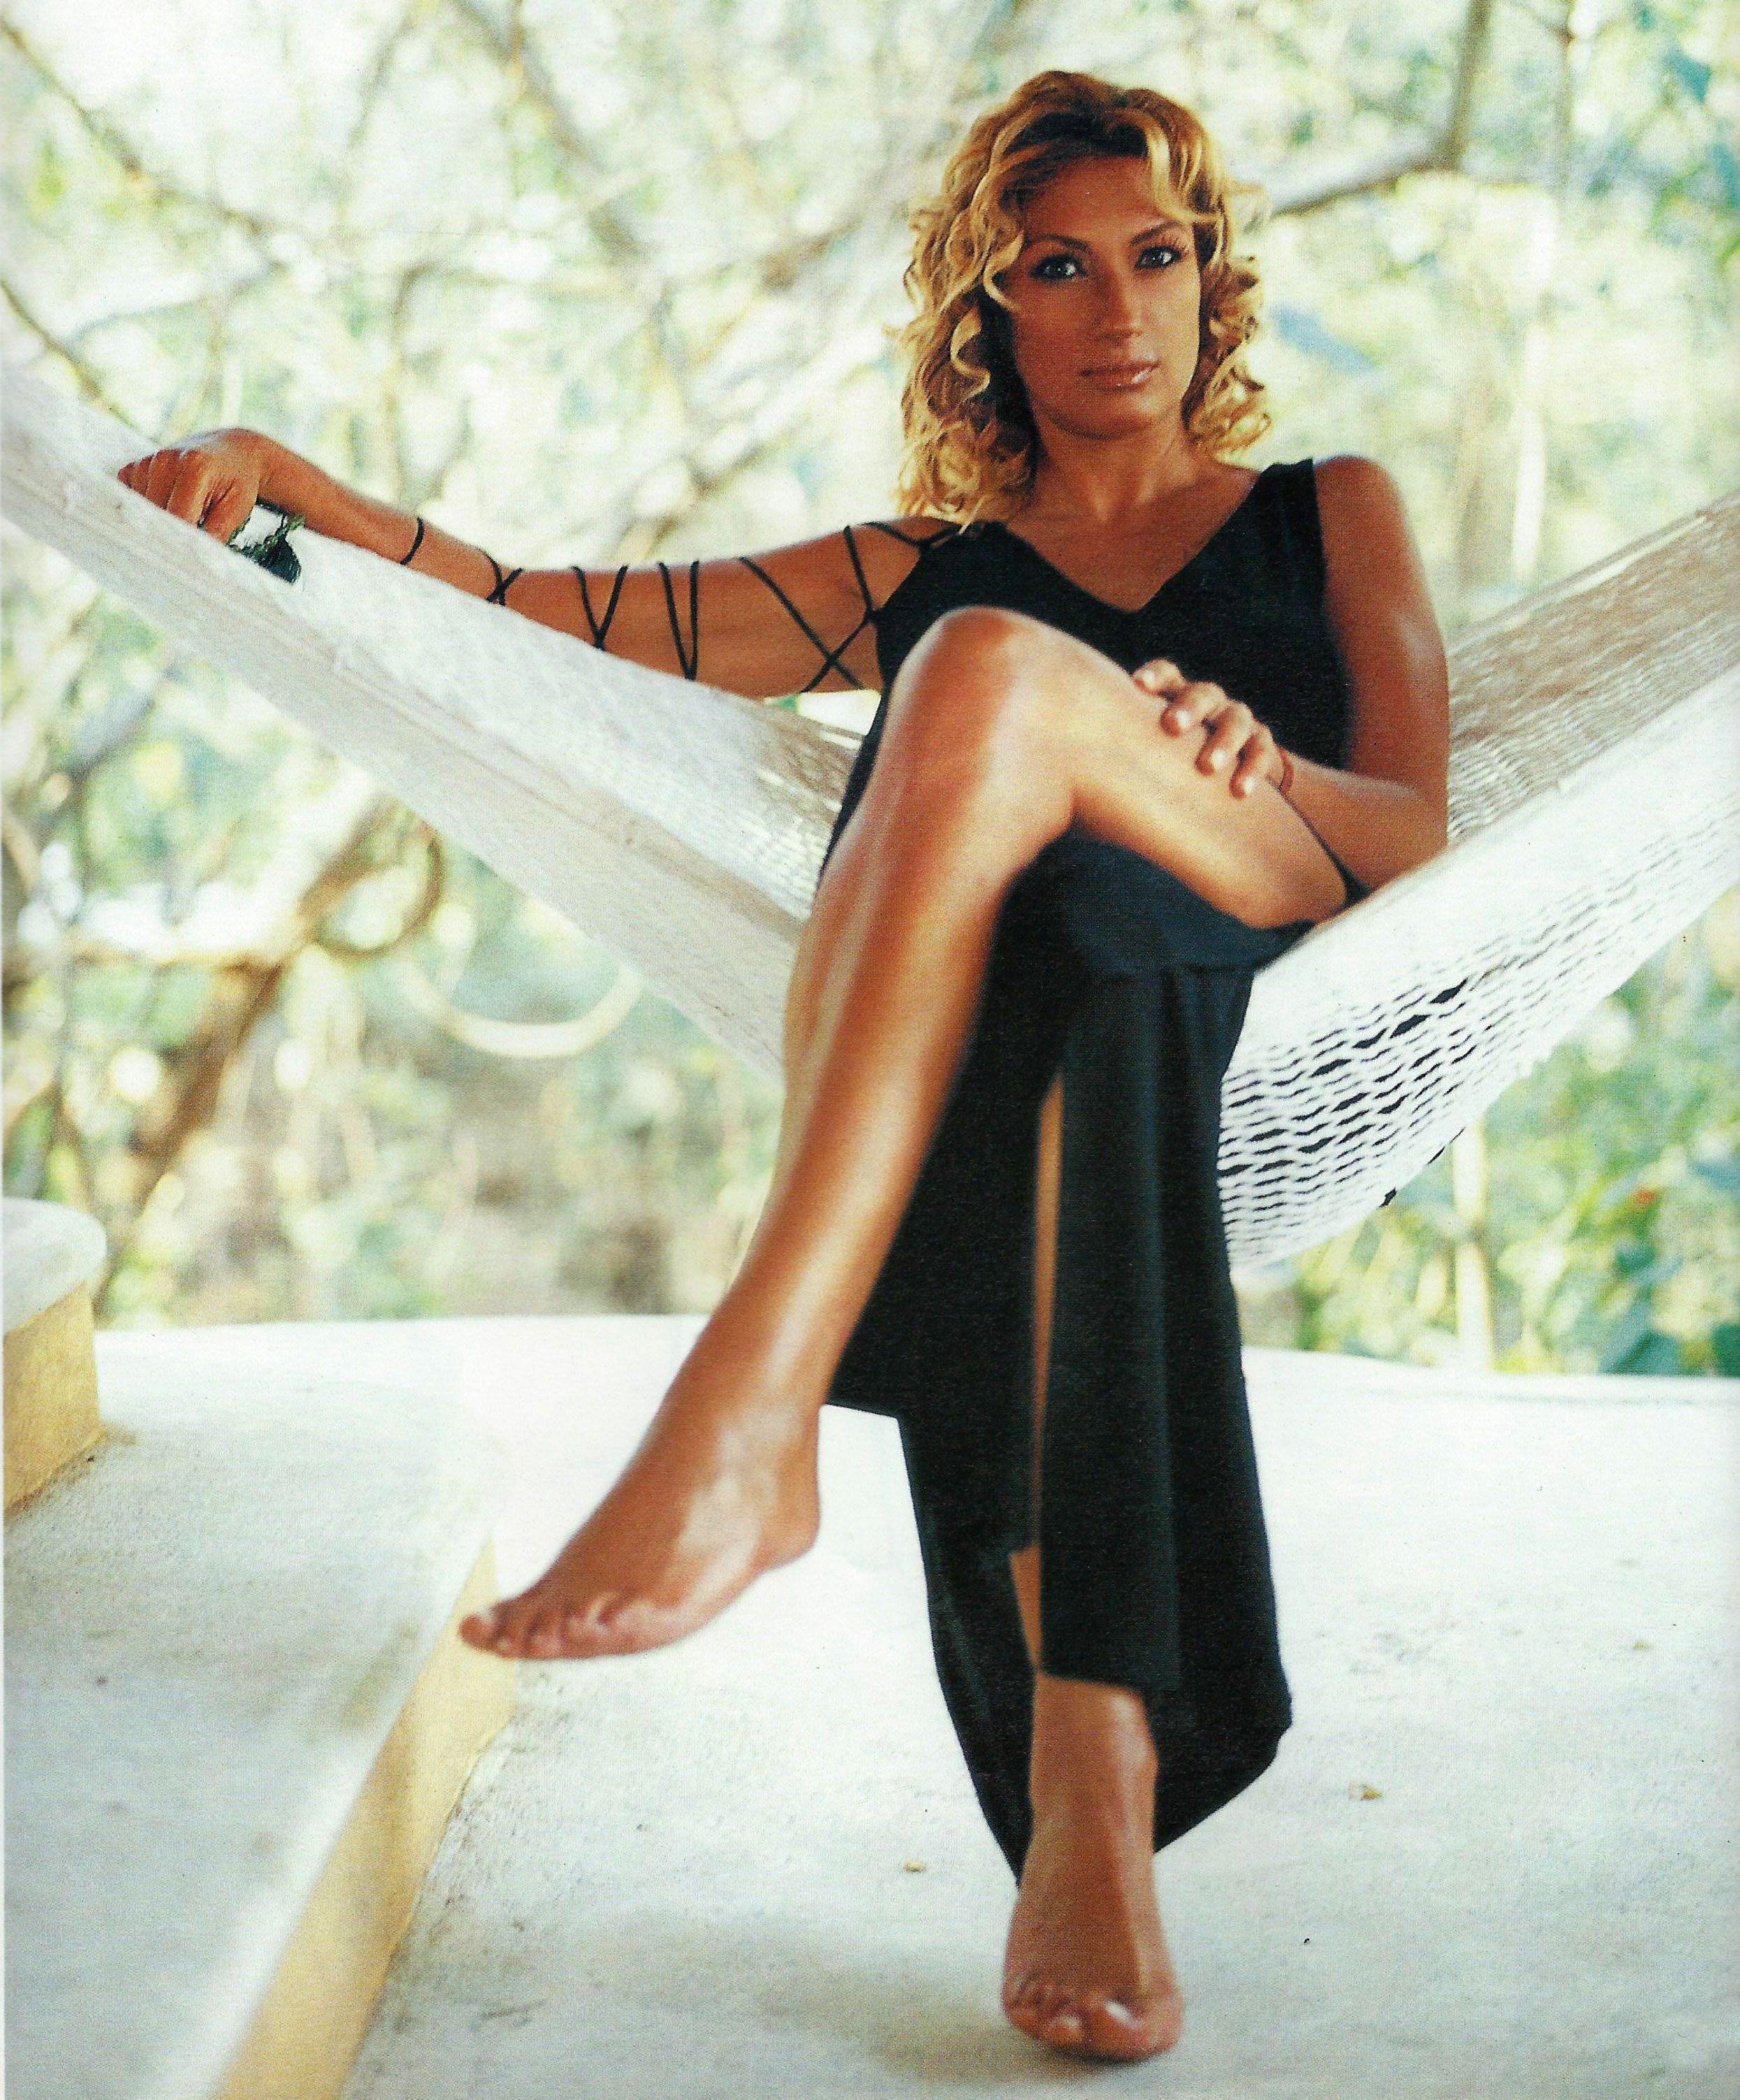 Adela-Micha-Feet-1128086.jpg (2490×3005)